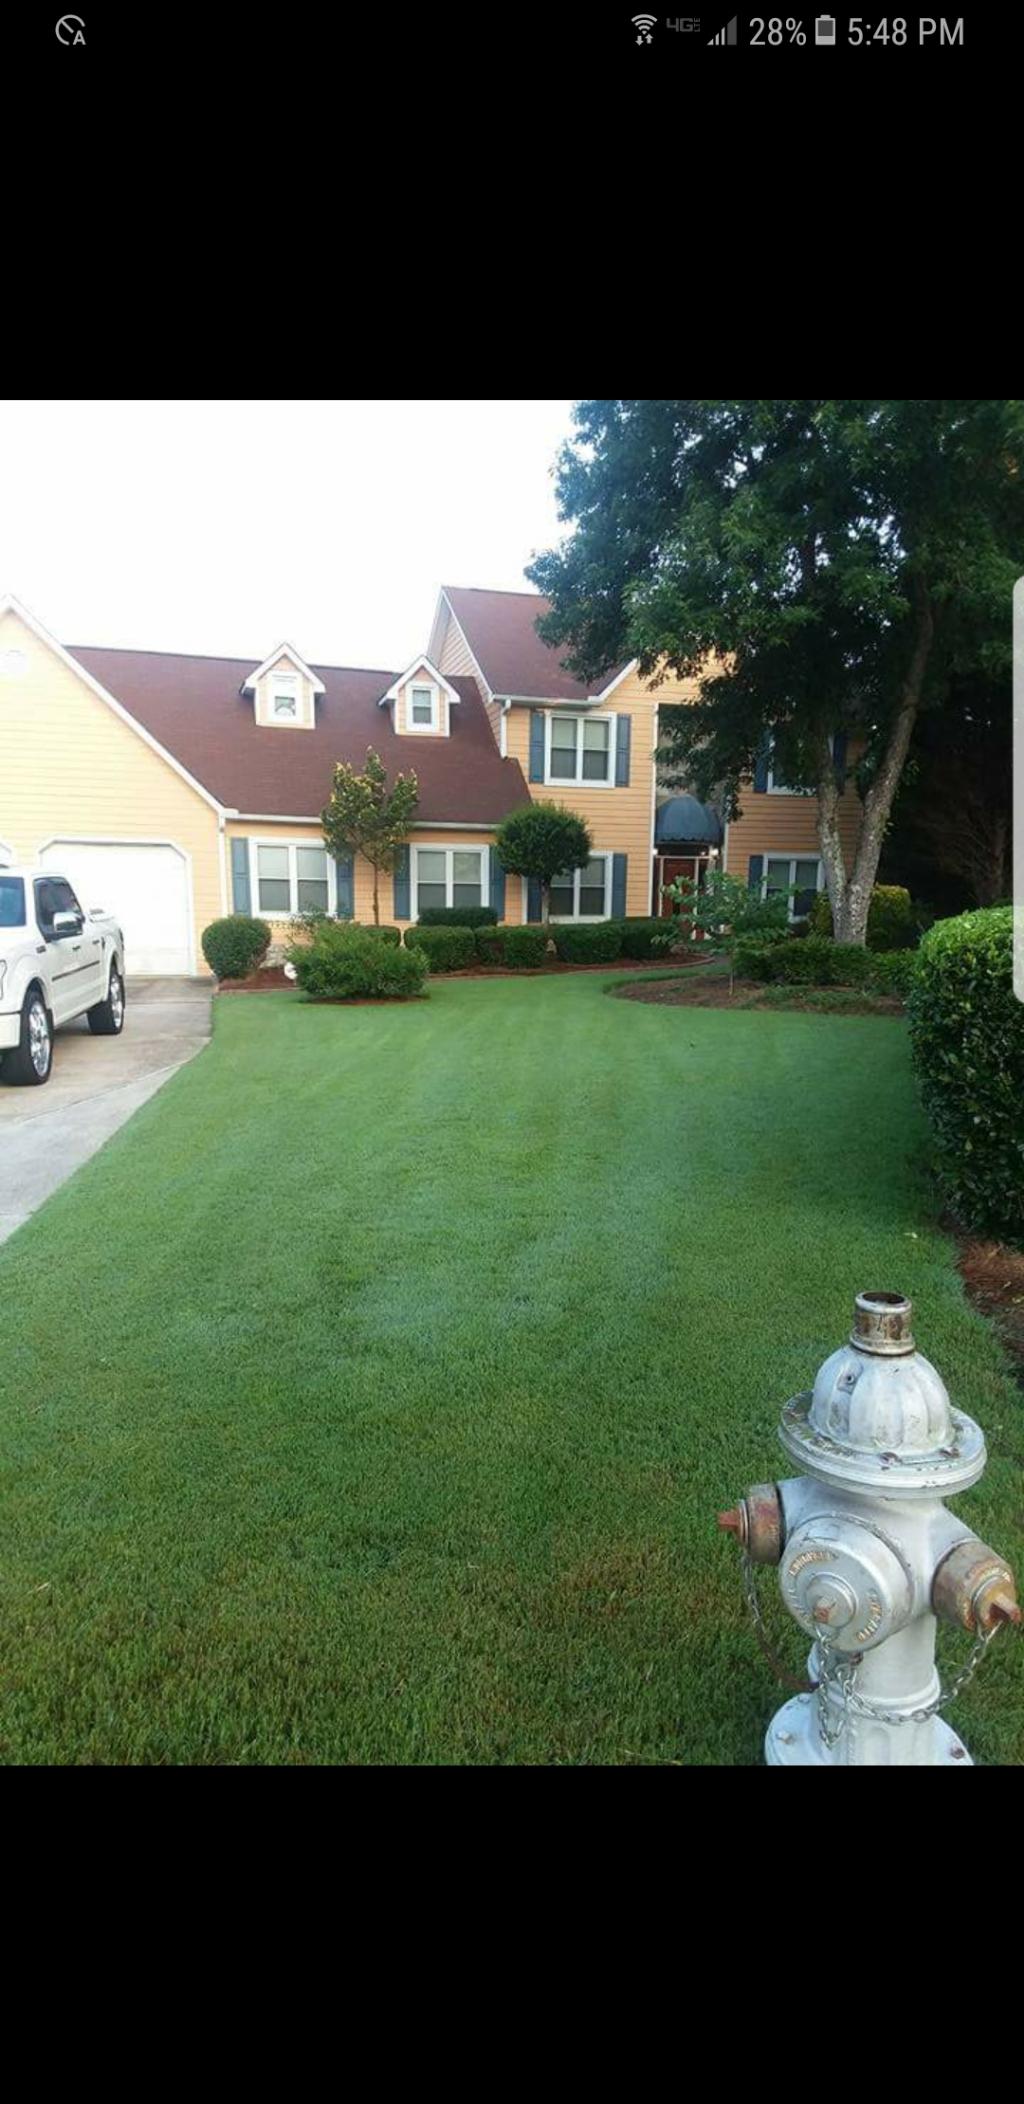 Yard mowing company in Atlanta, GA, 30331